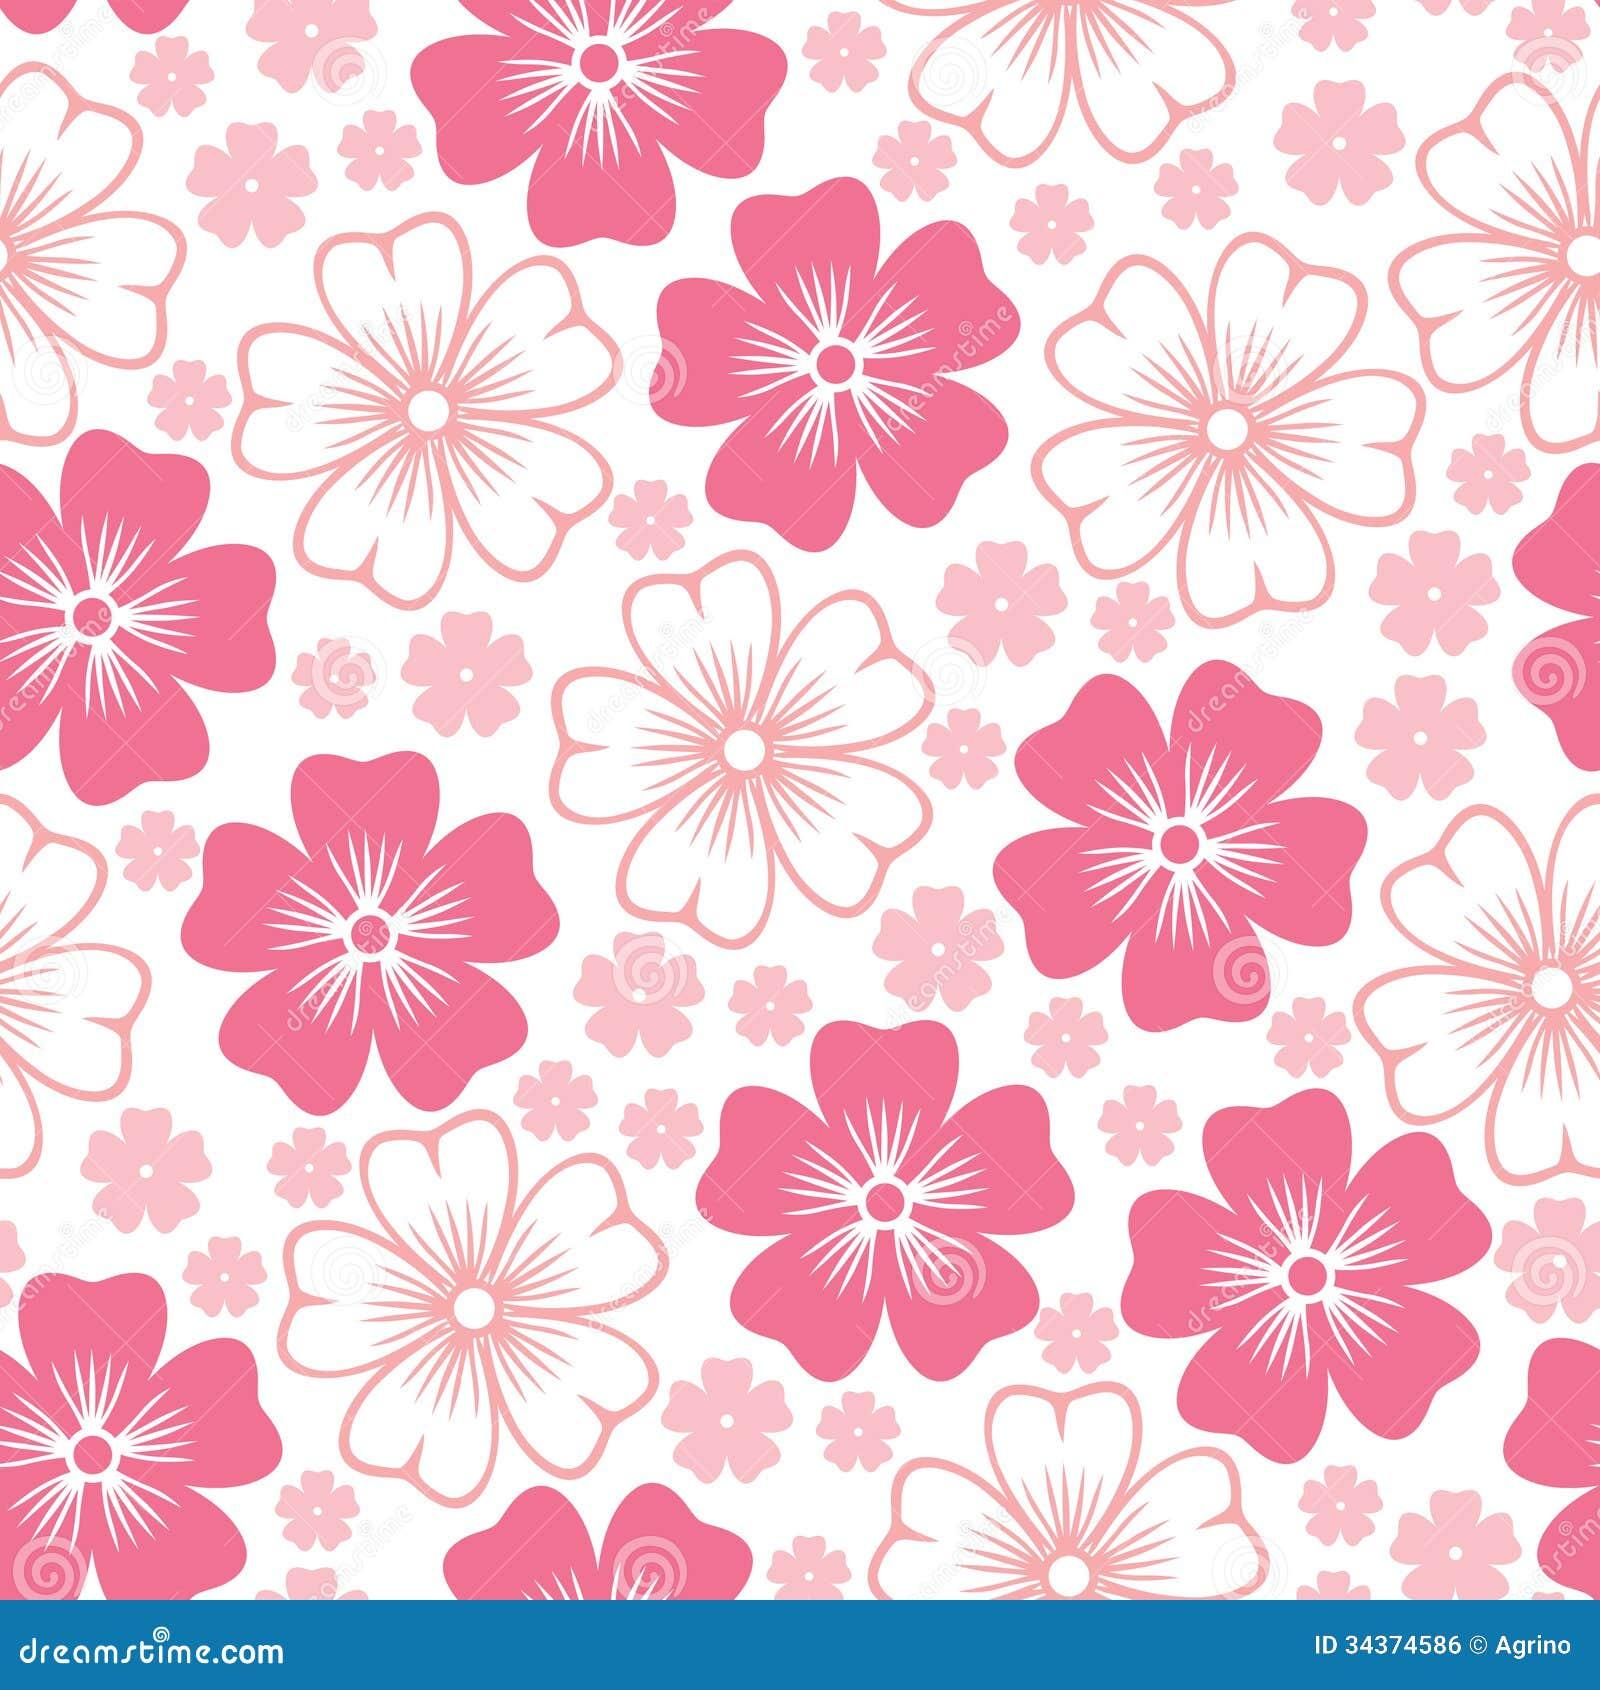 Pink Flower Seamless Pattern Royalty Free Stock Image Image